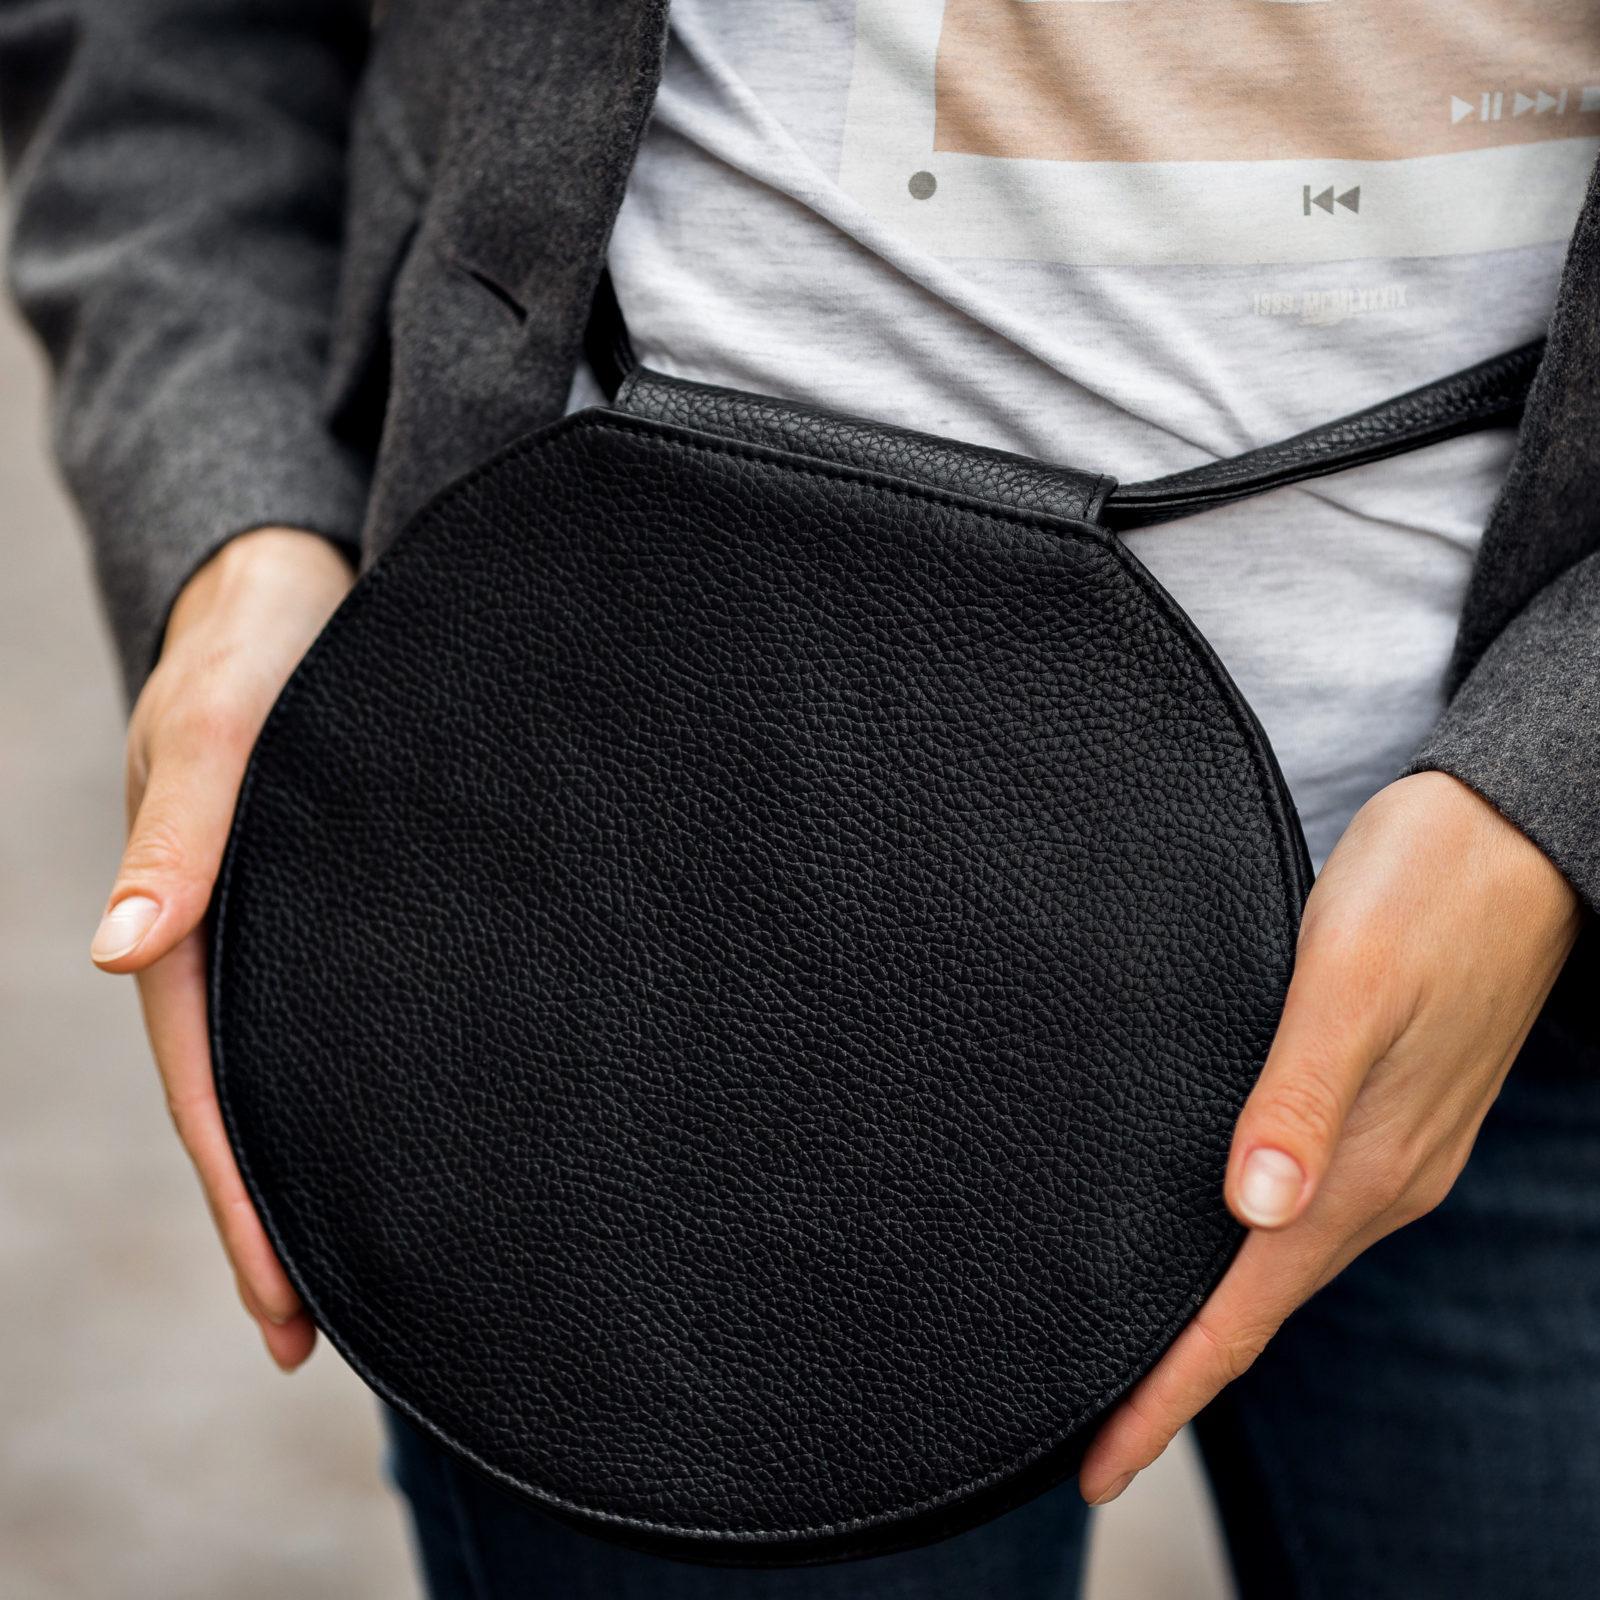 Фото: кругла класна сумка натуральна шкіра